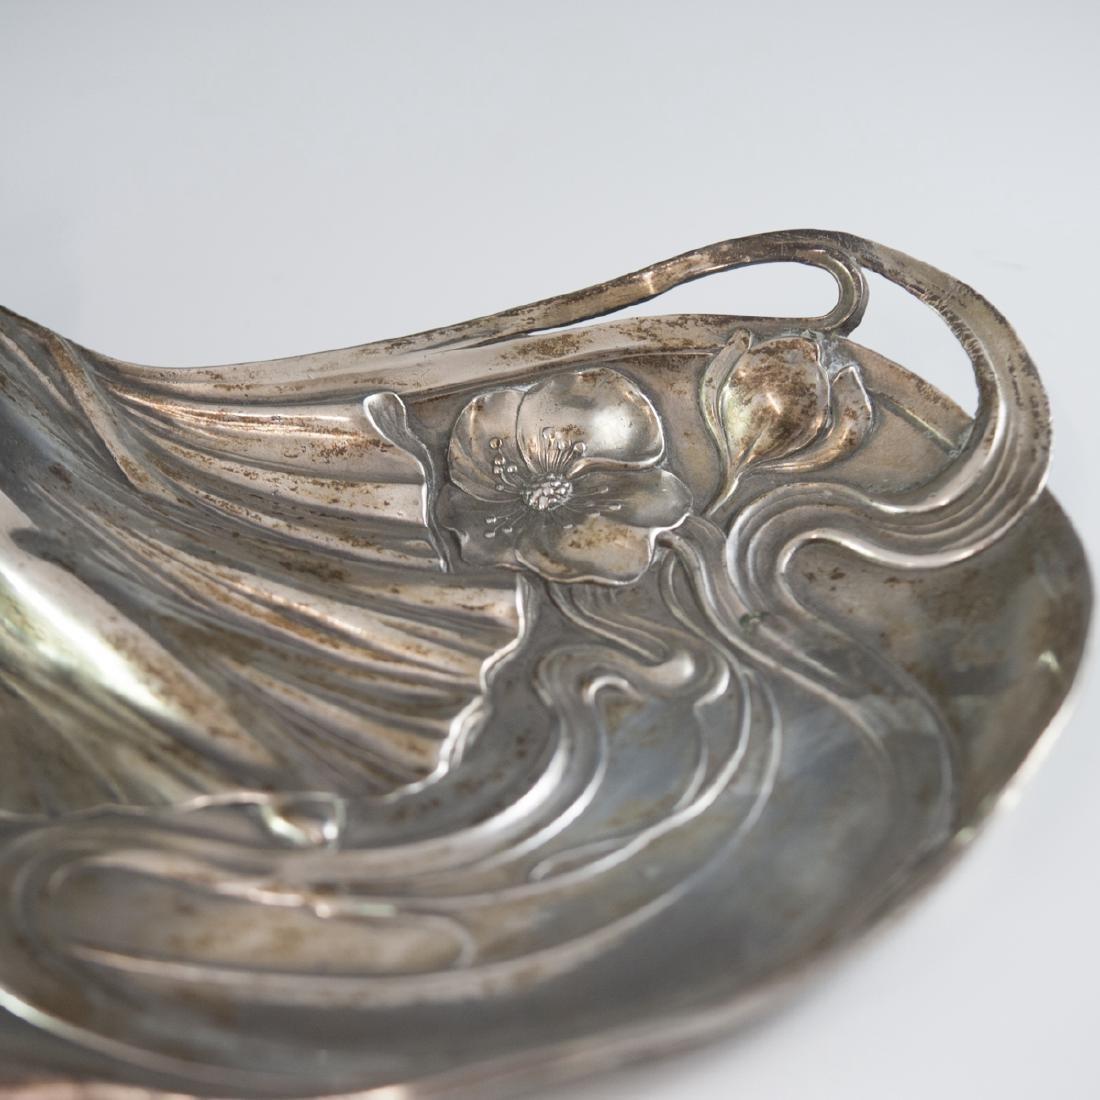 WMF Silver Plated Art Nouveau Dish - 4